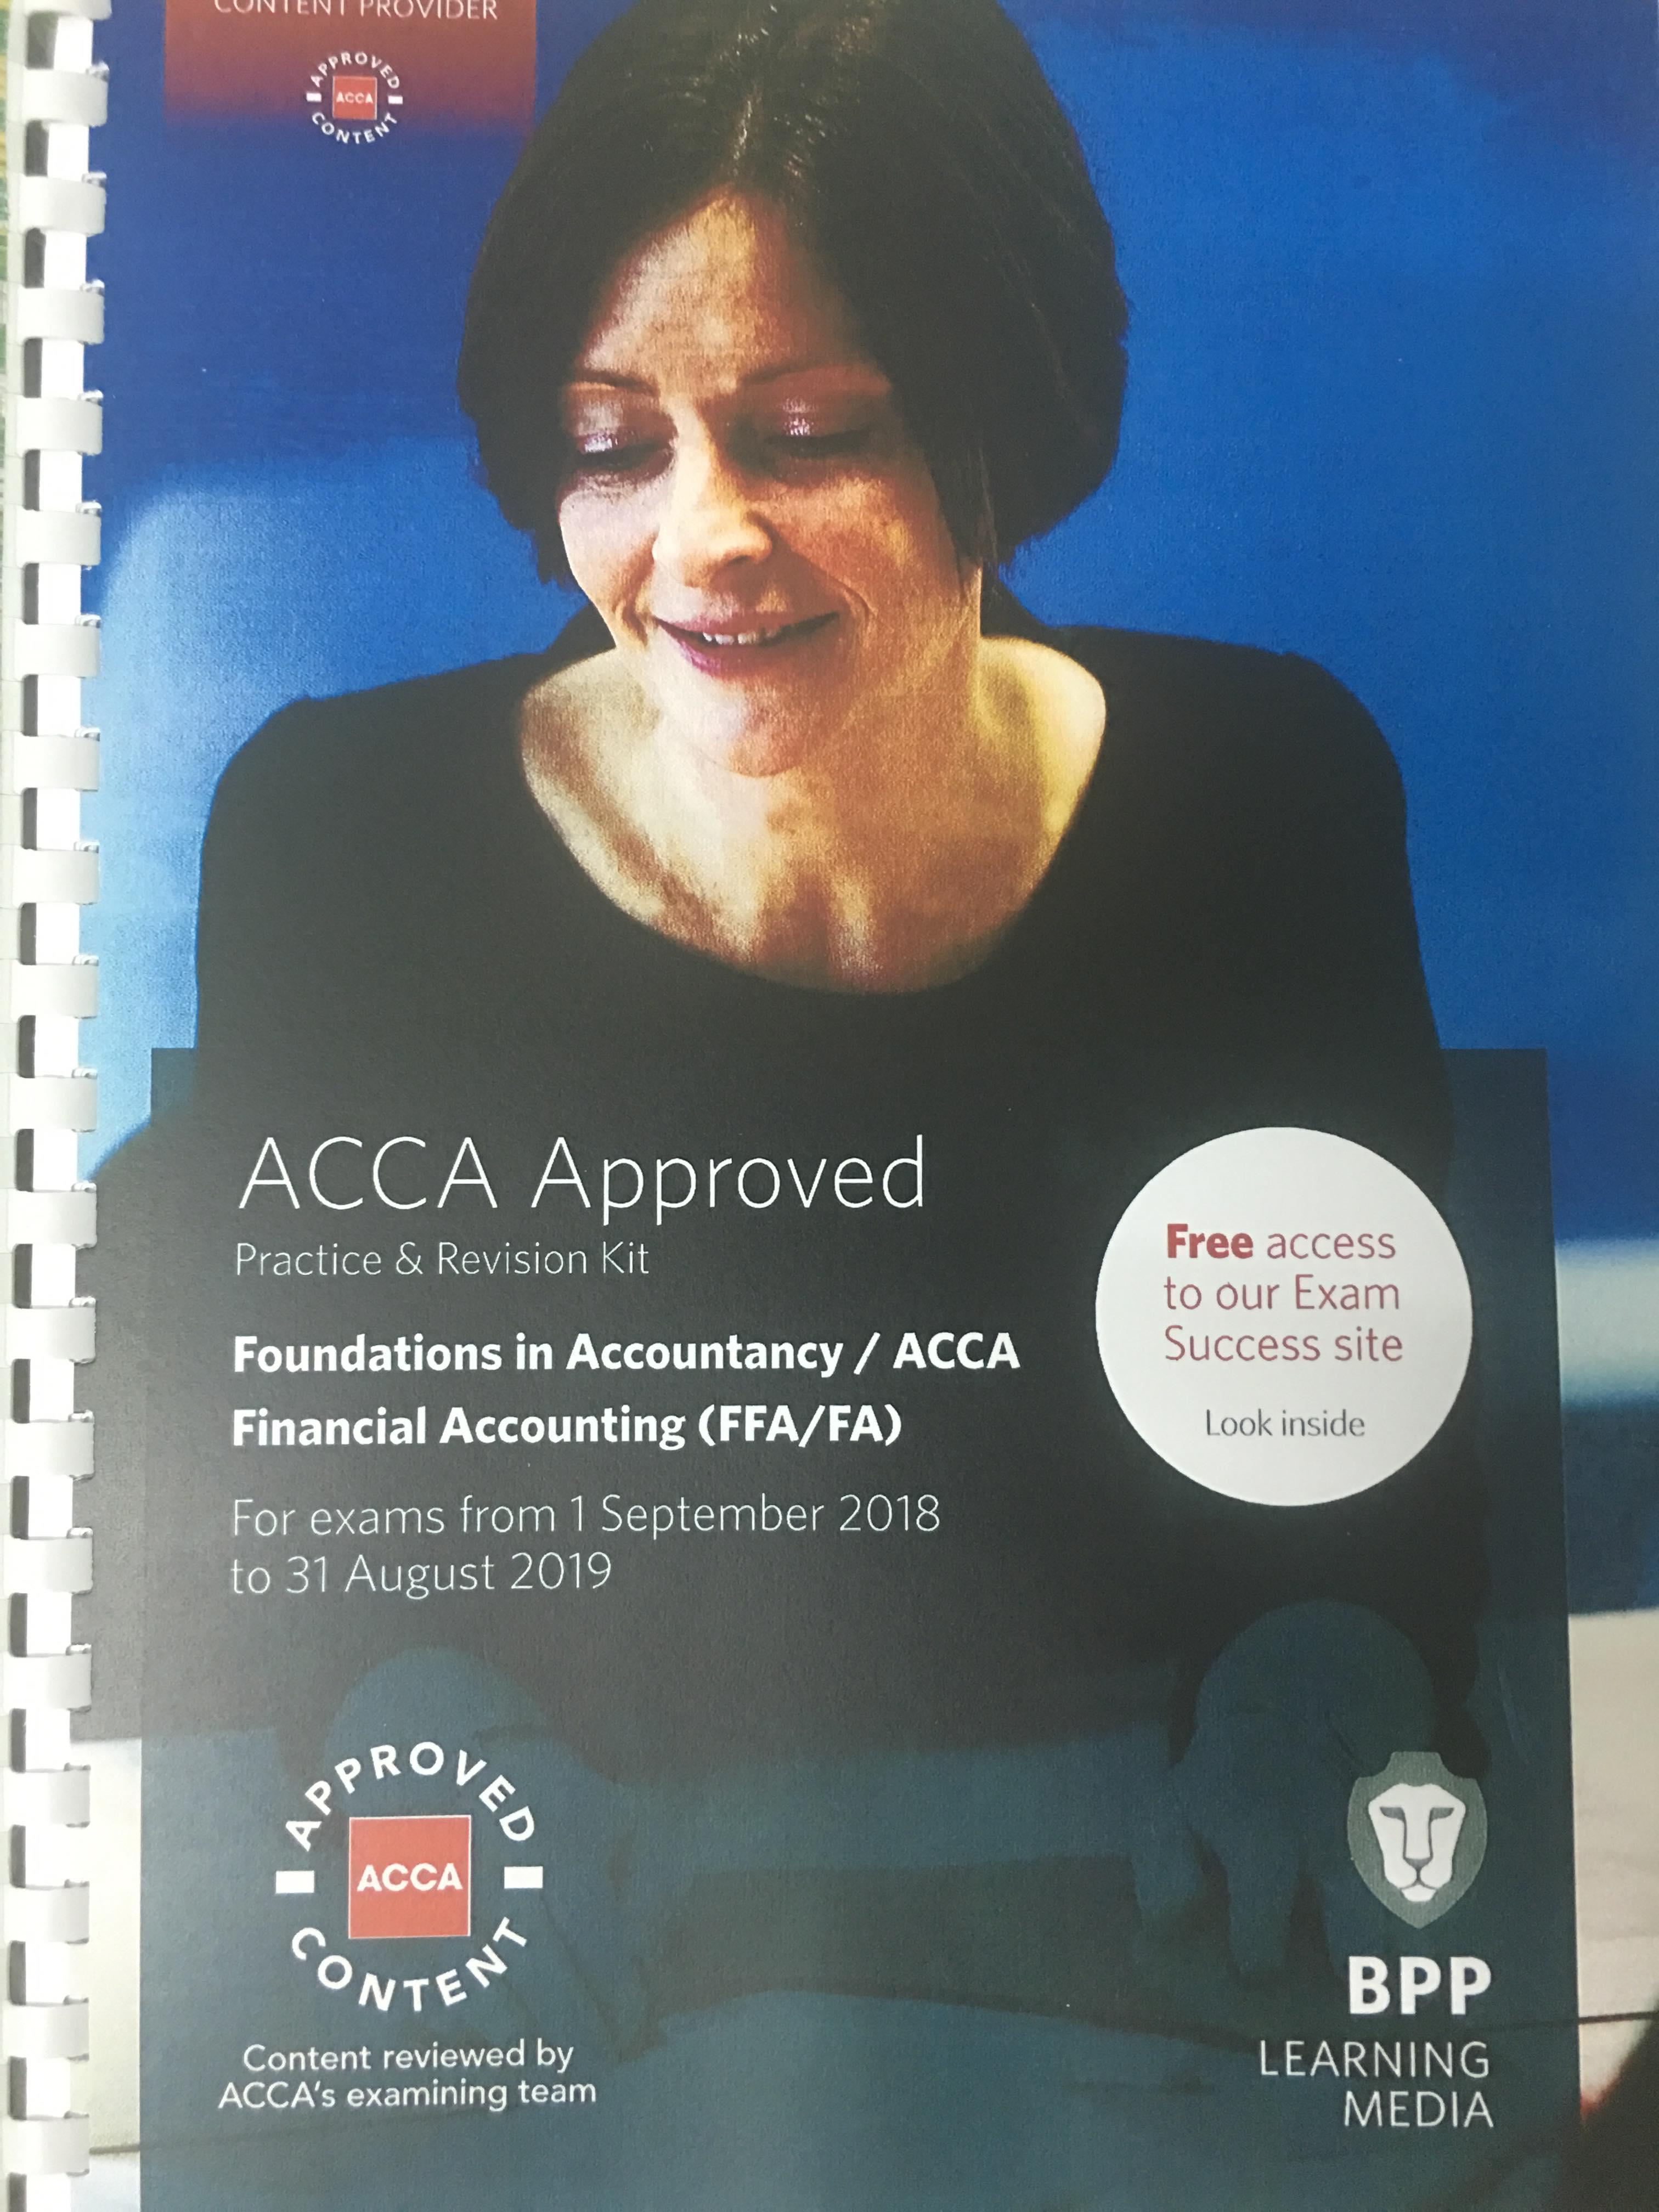 SÁCH ACCA F3 NĂM 2019 (STUDY TEXT+ REVISION KIT)